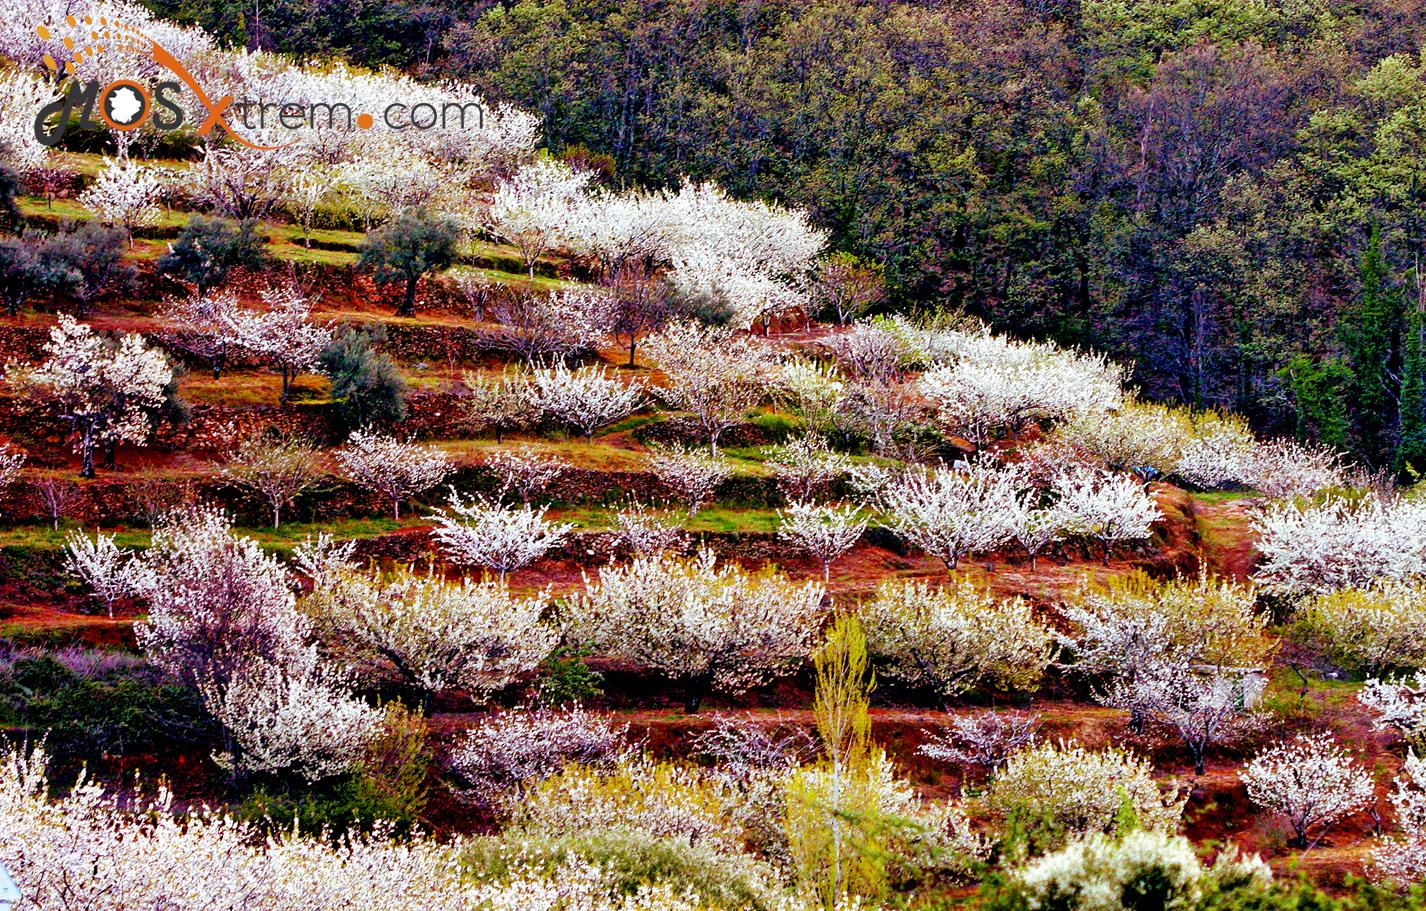 floracion-cerezo-jerte-caceres